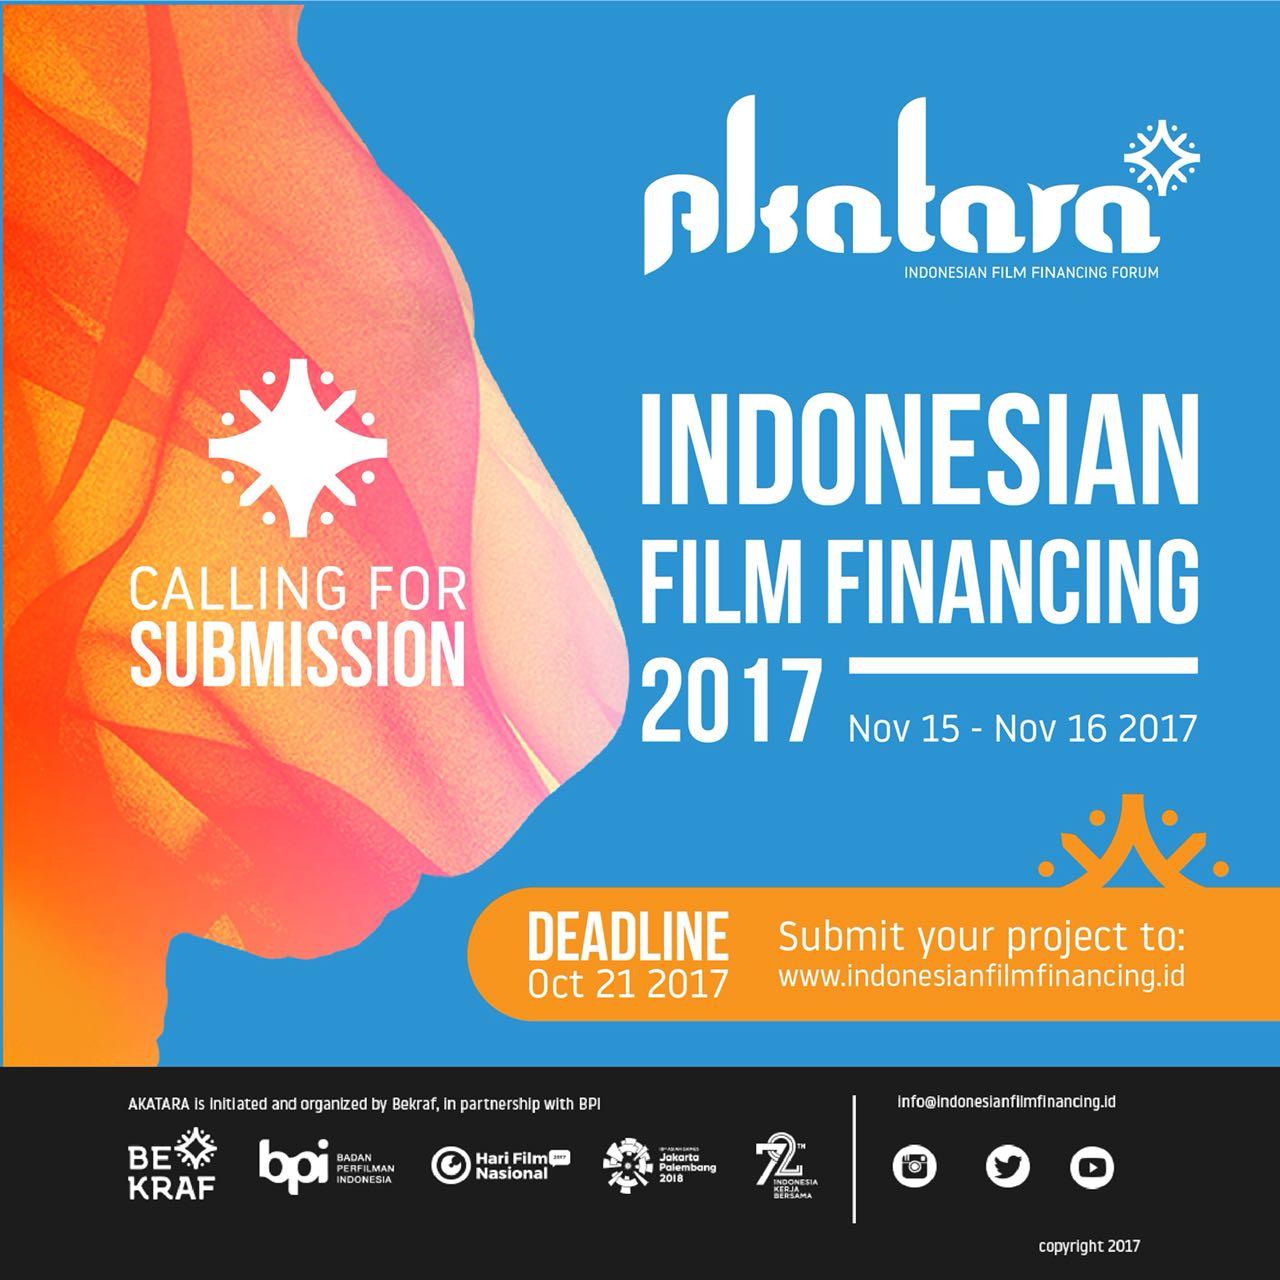 Akatara Indonesia Film Financing